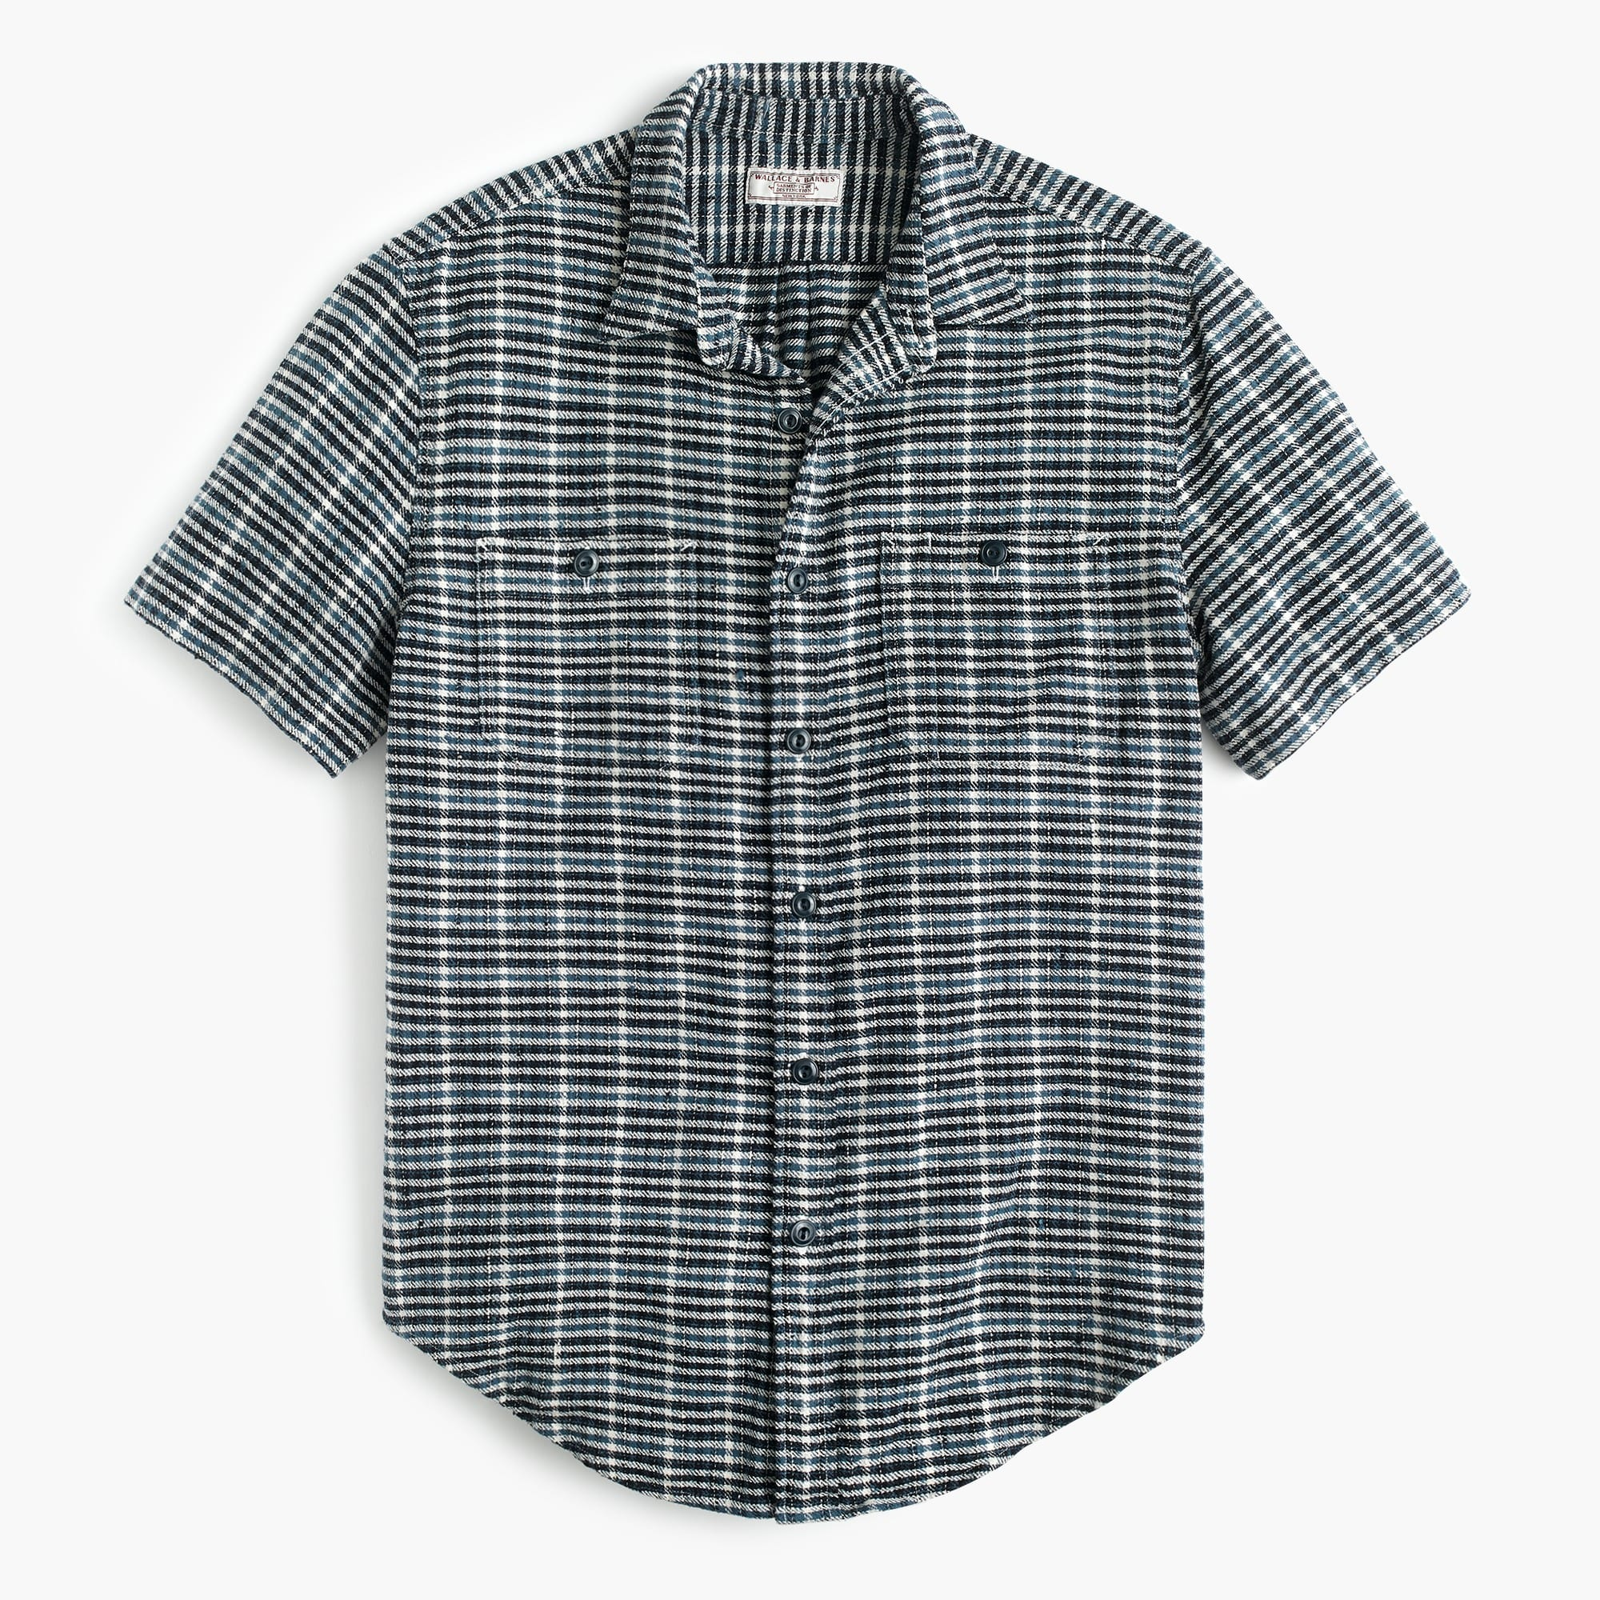 Wallace & Barnes short-sleeve slubby twill workshirt